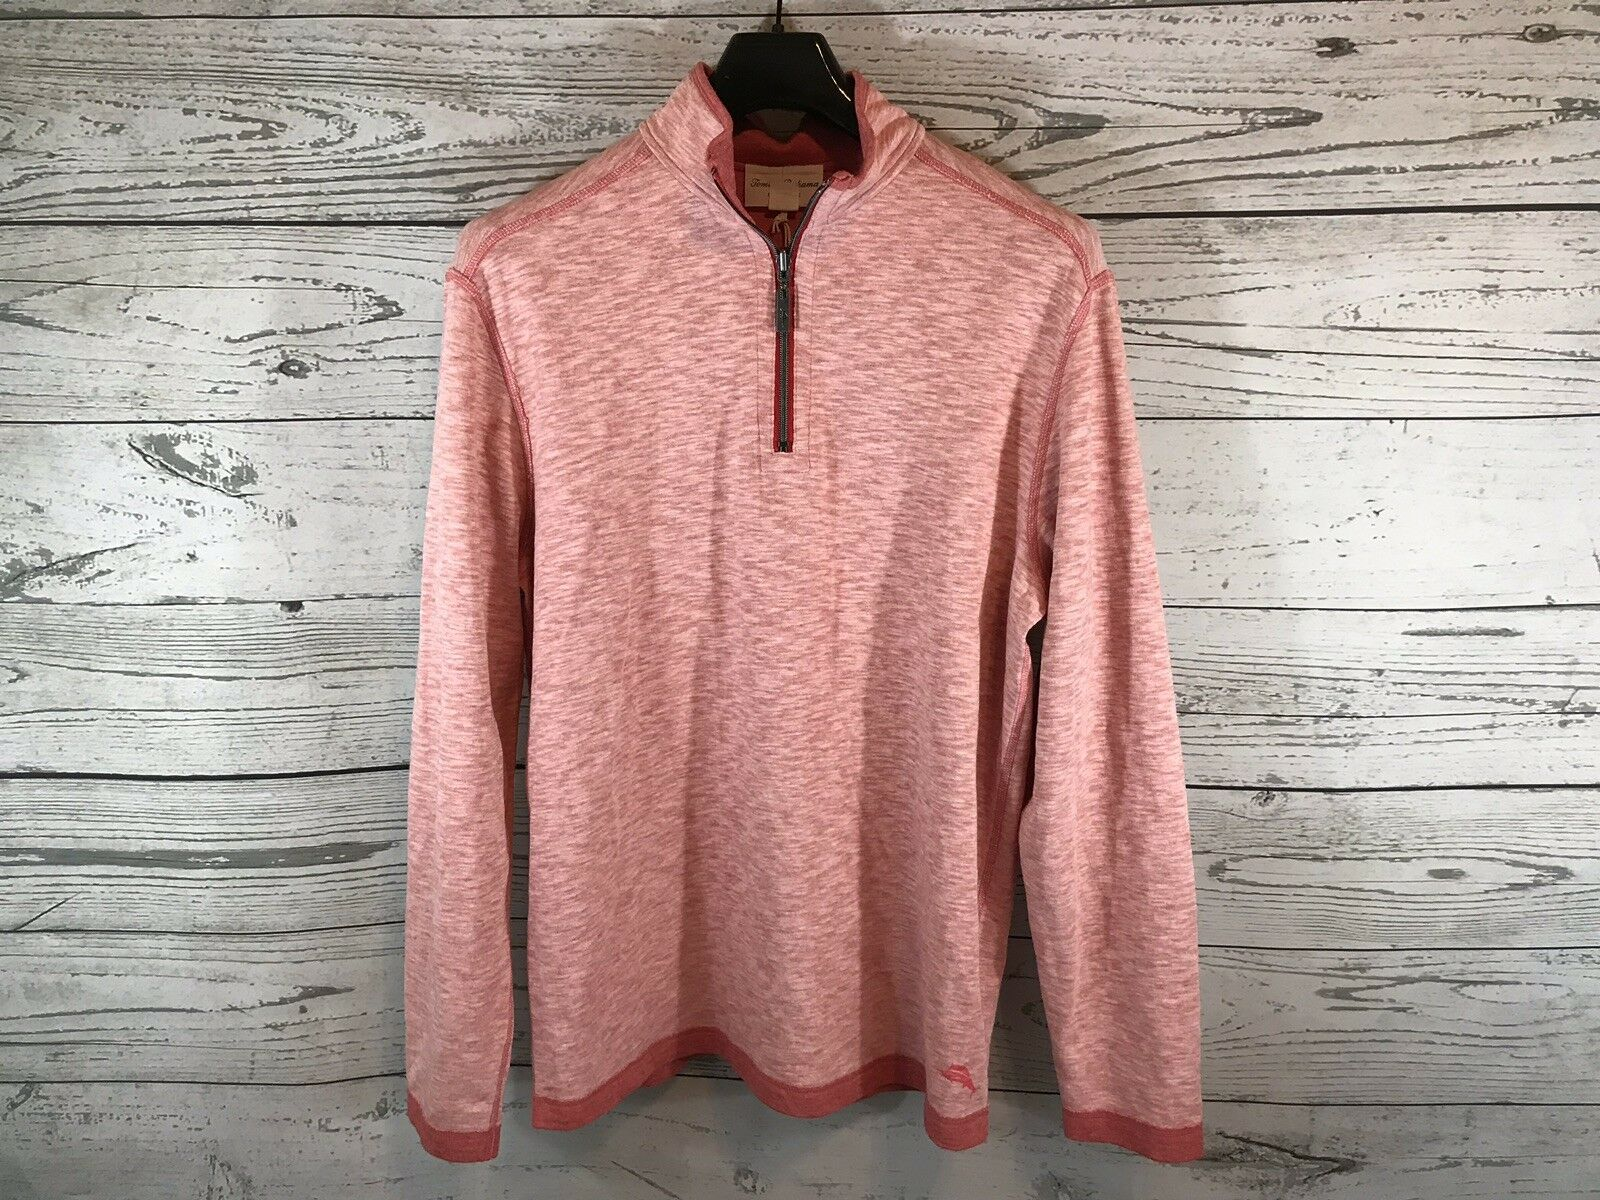 Tommy Bahama  Herren Light ROT Reversible 1/4 ZIP Pullover Sweater Größe Medium NWT